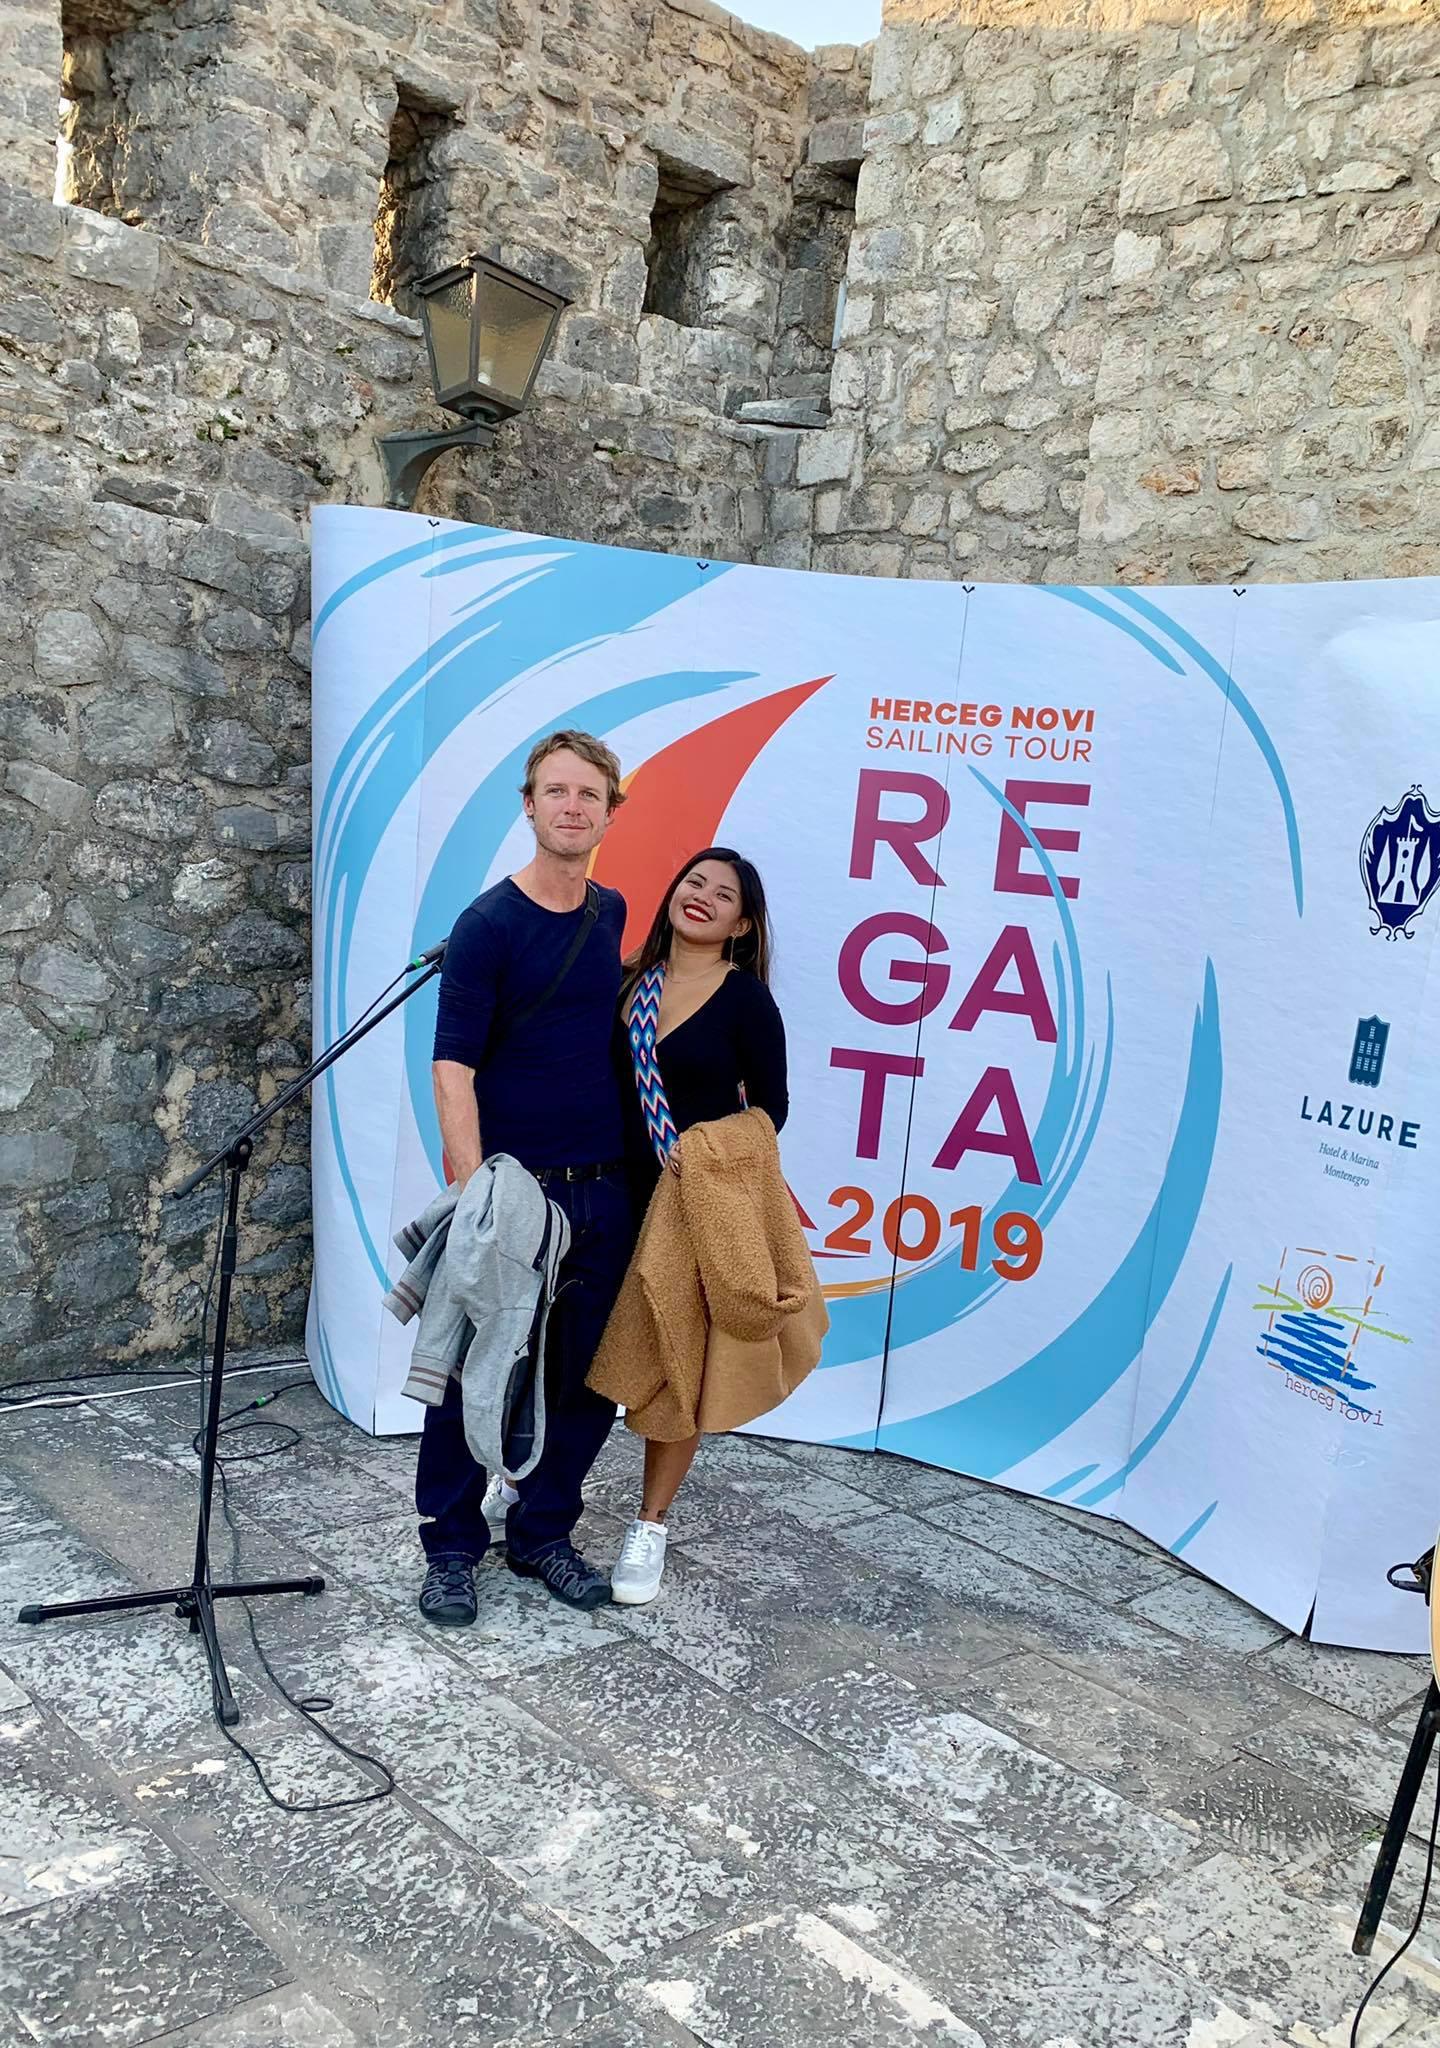 Expat Life in Montenegro Day 2 First full day in Herceg Novi18.jpg